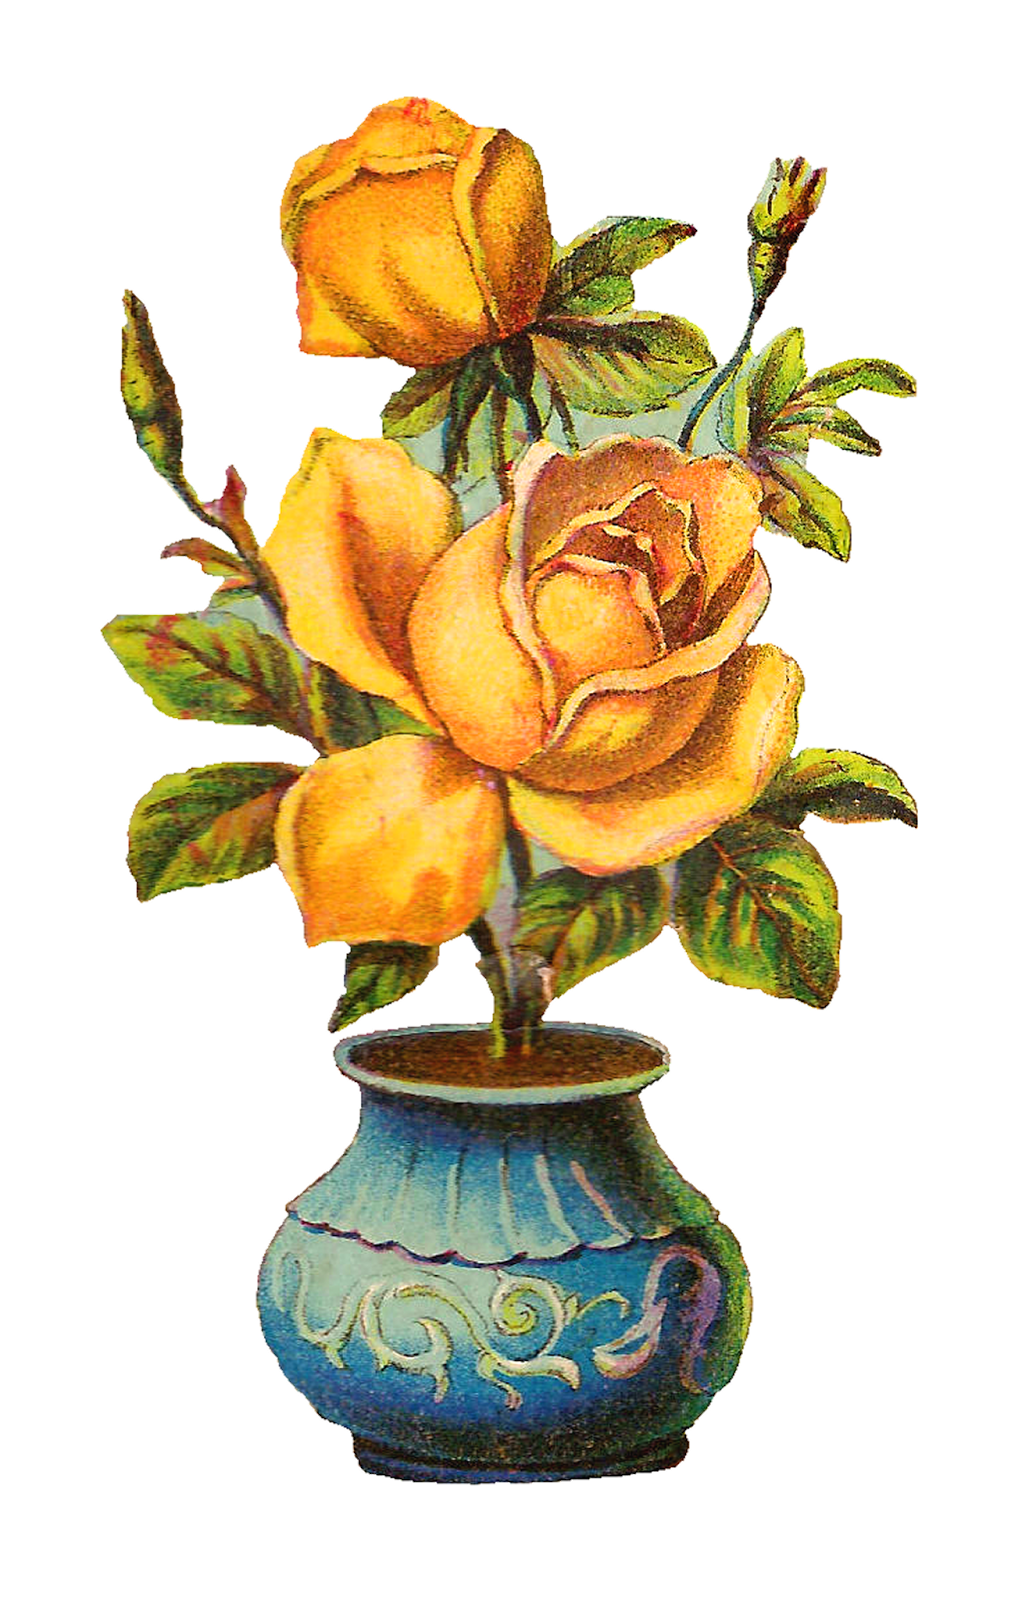 Antique Images: Vintage Botanical Yellow Rose Digital ...